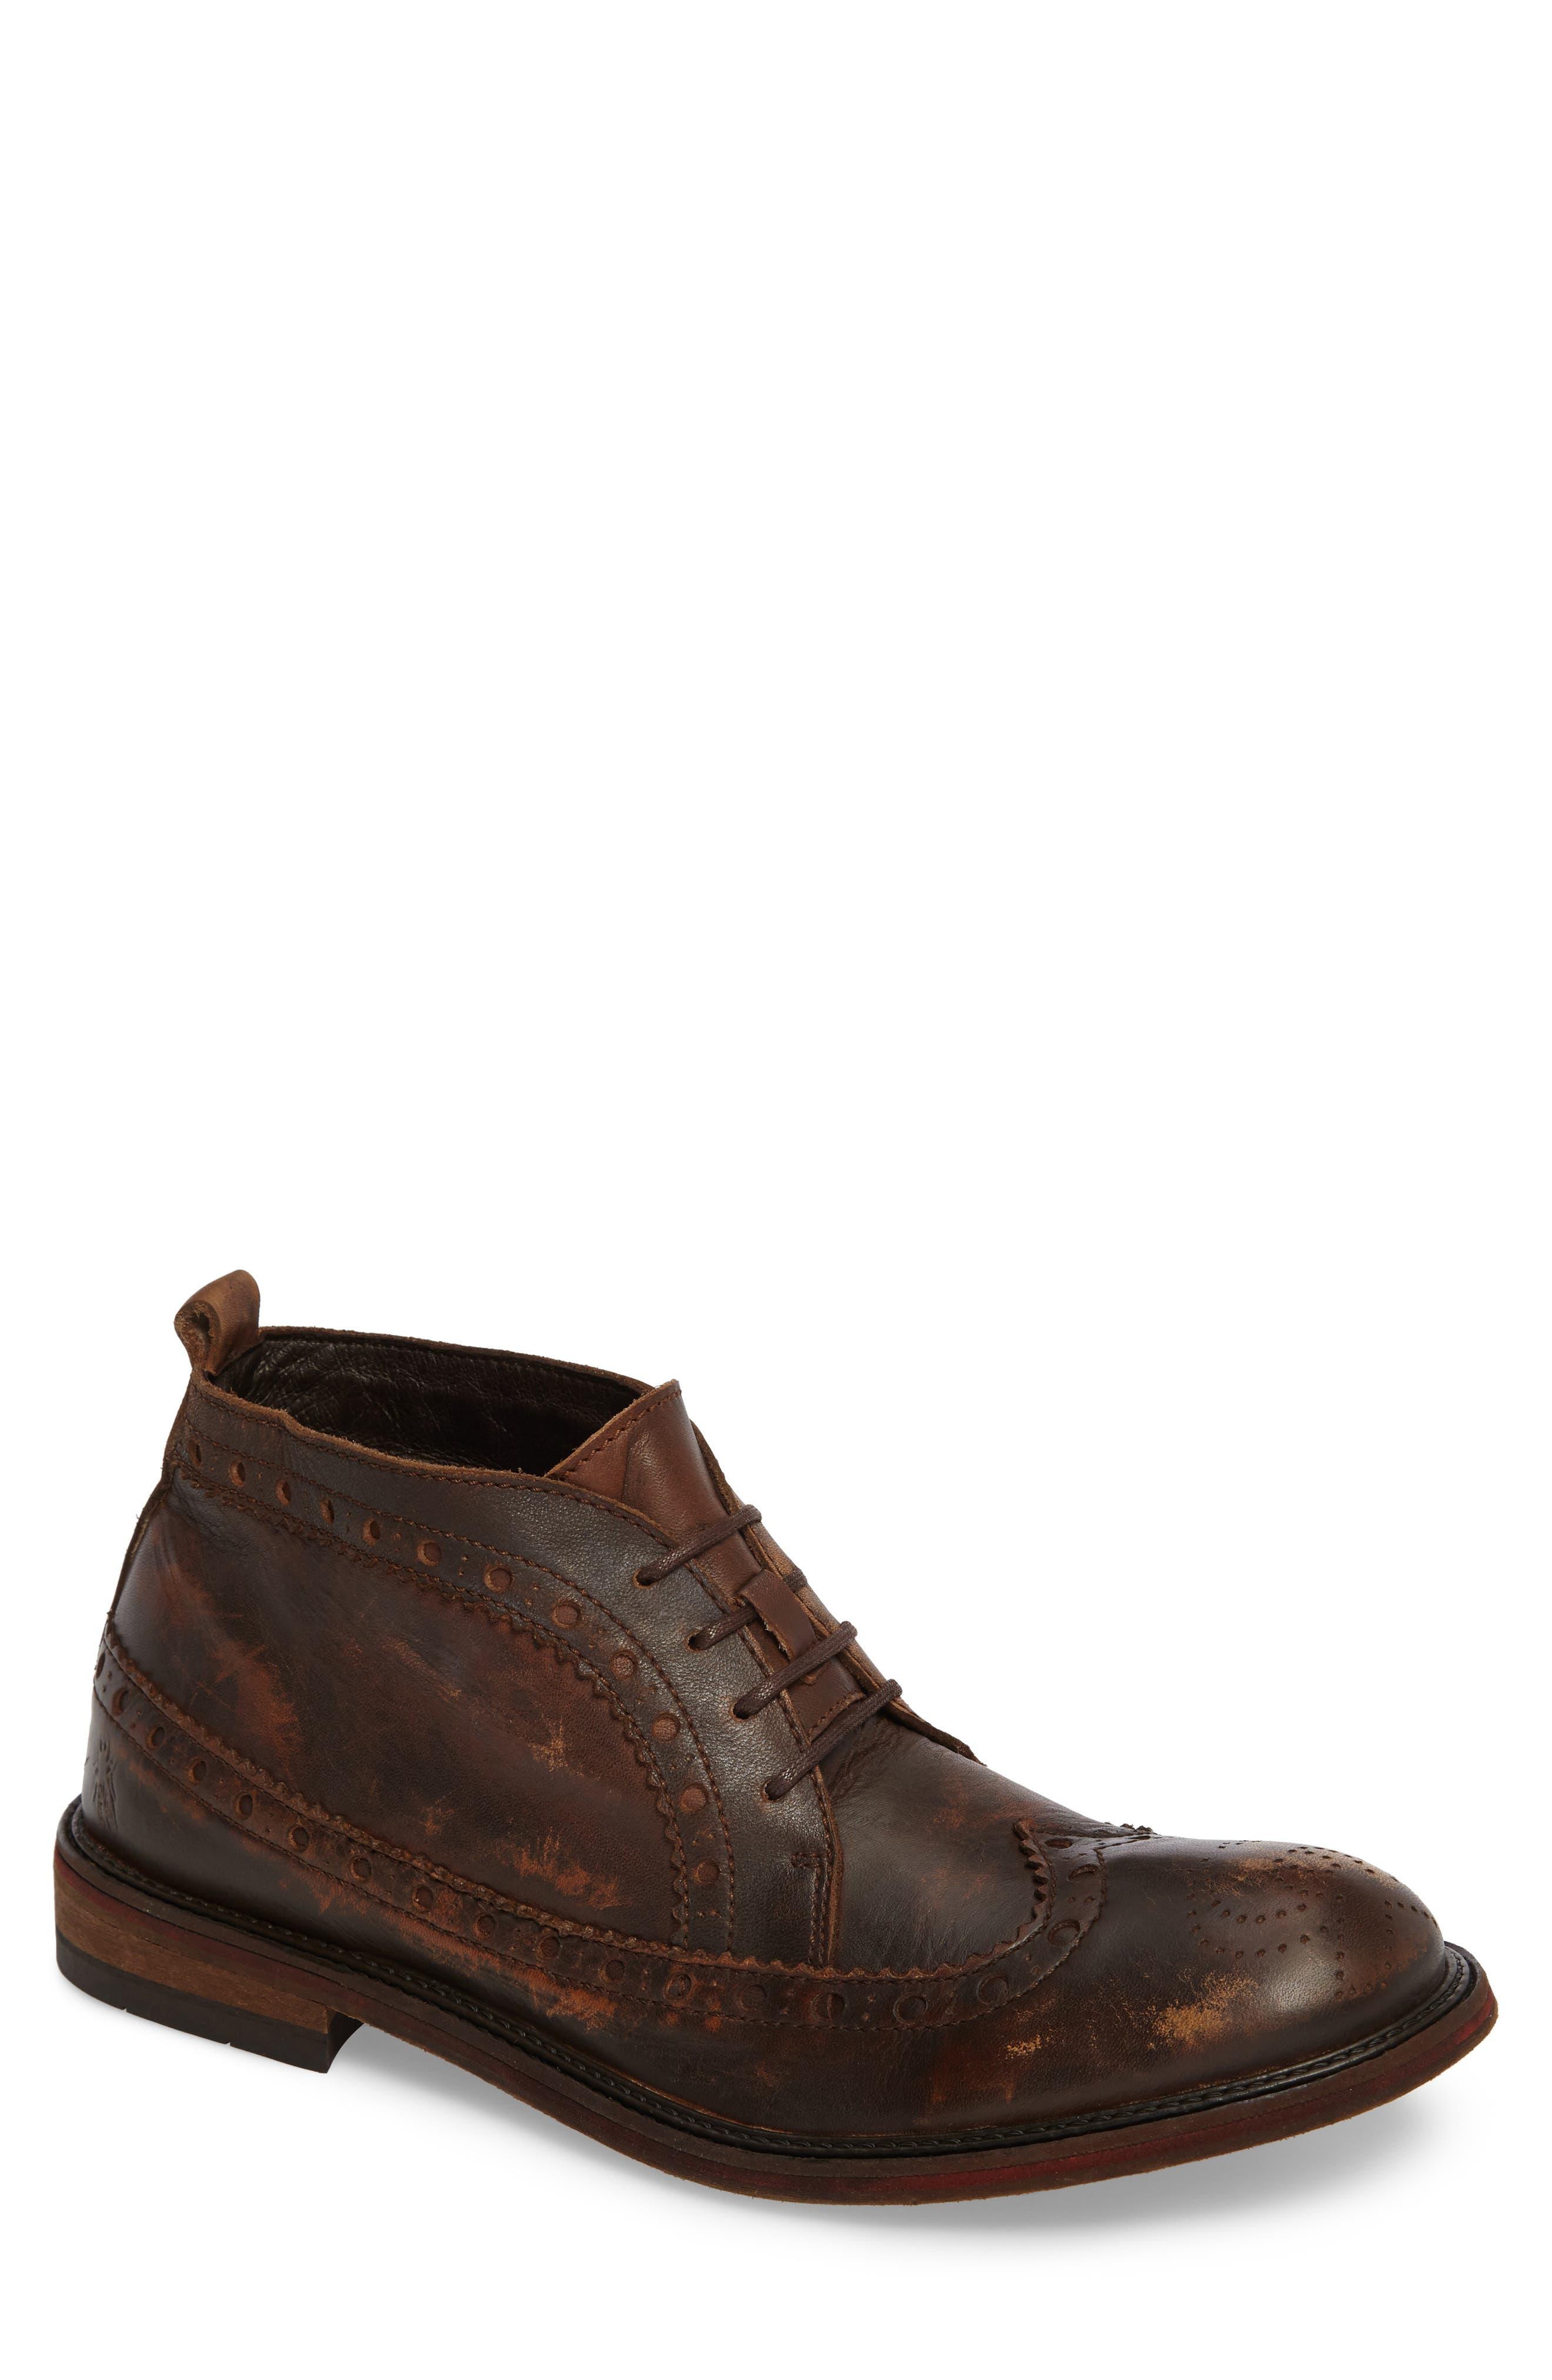 Alternate Image 1 Selected - Fly London Wile Wingtip Chukka Boot (Men)